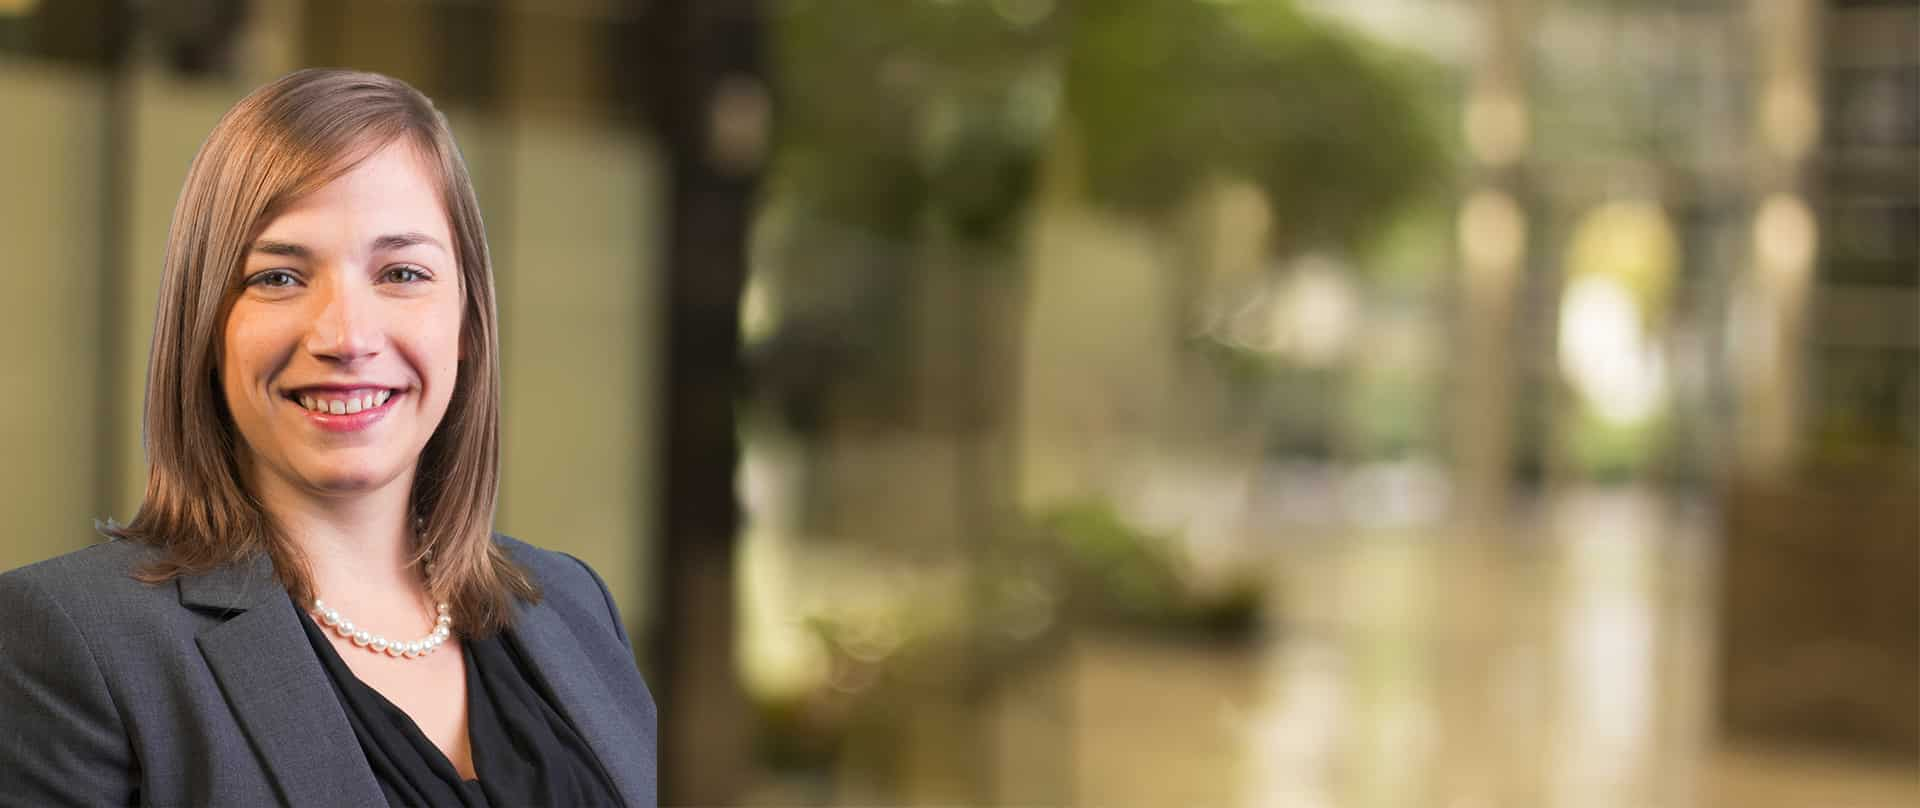 Meet Rachel Aguilera-Vanderheyden, MA, Manager Of Talent Solutions Delivery